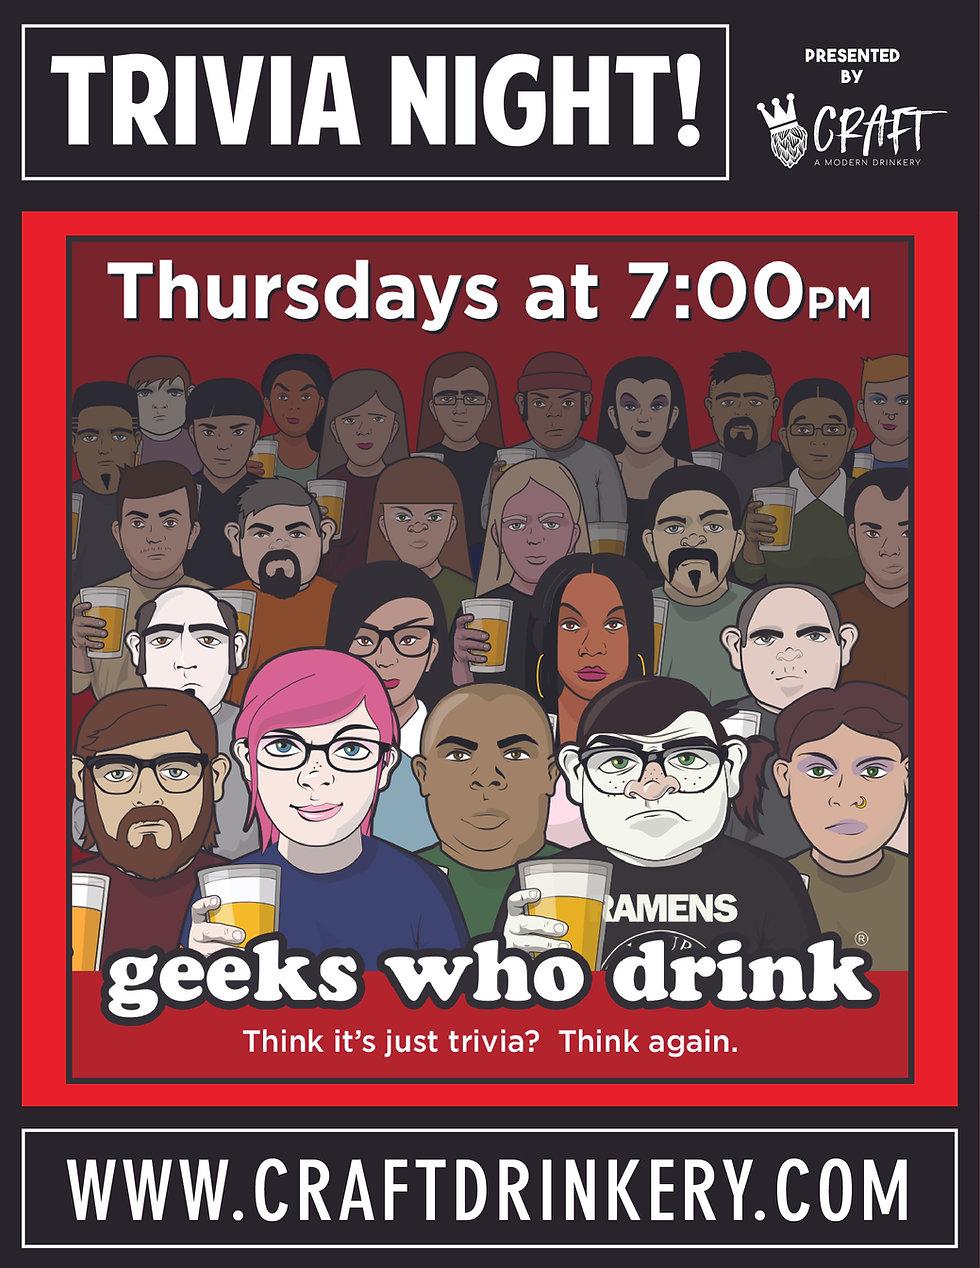 Craft - Geeks Who Drink Flyer 2021.jpg